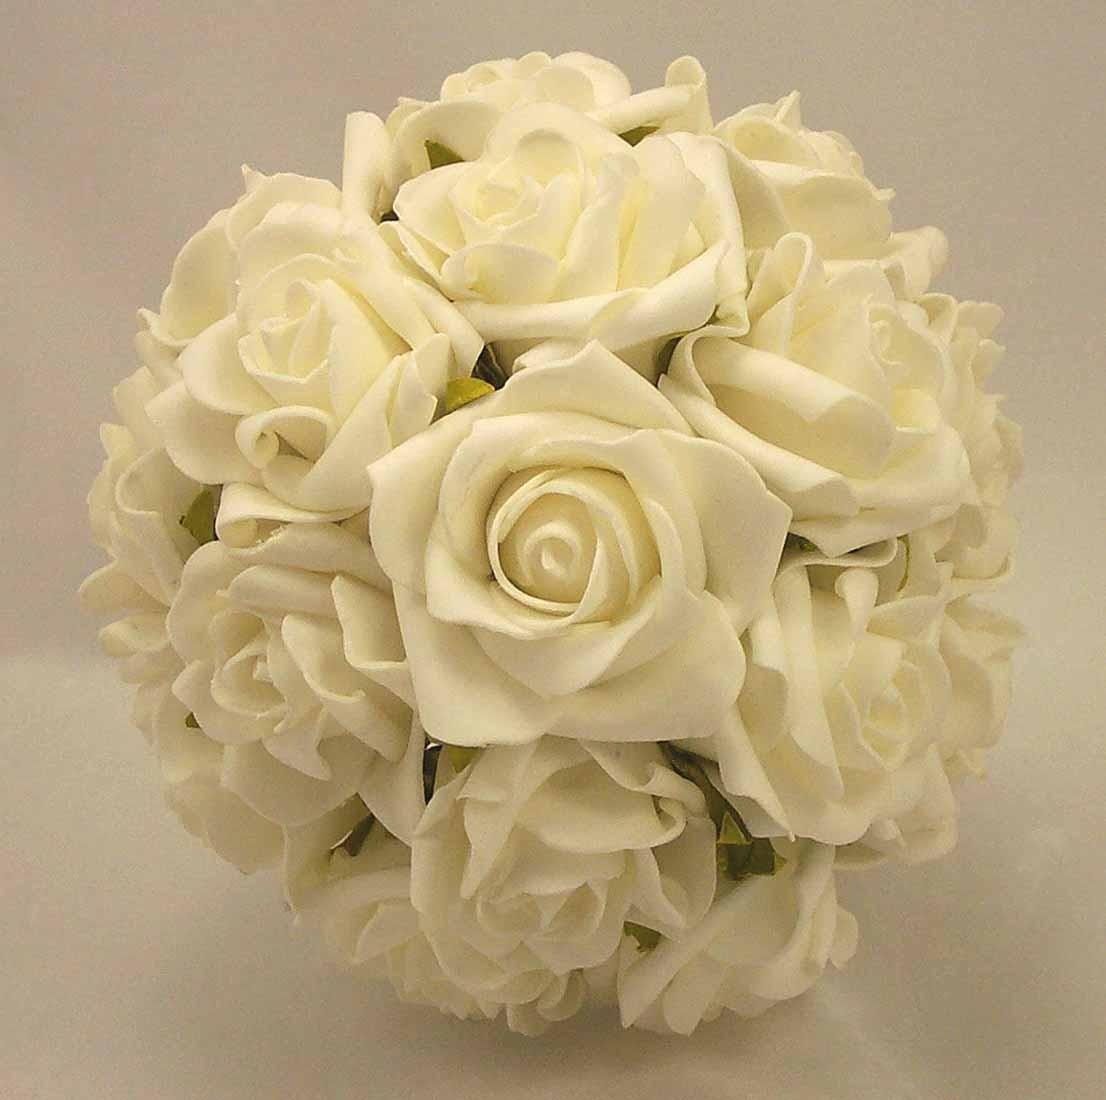 Pearl White Rose Bridesmaid's Bouquet